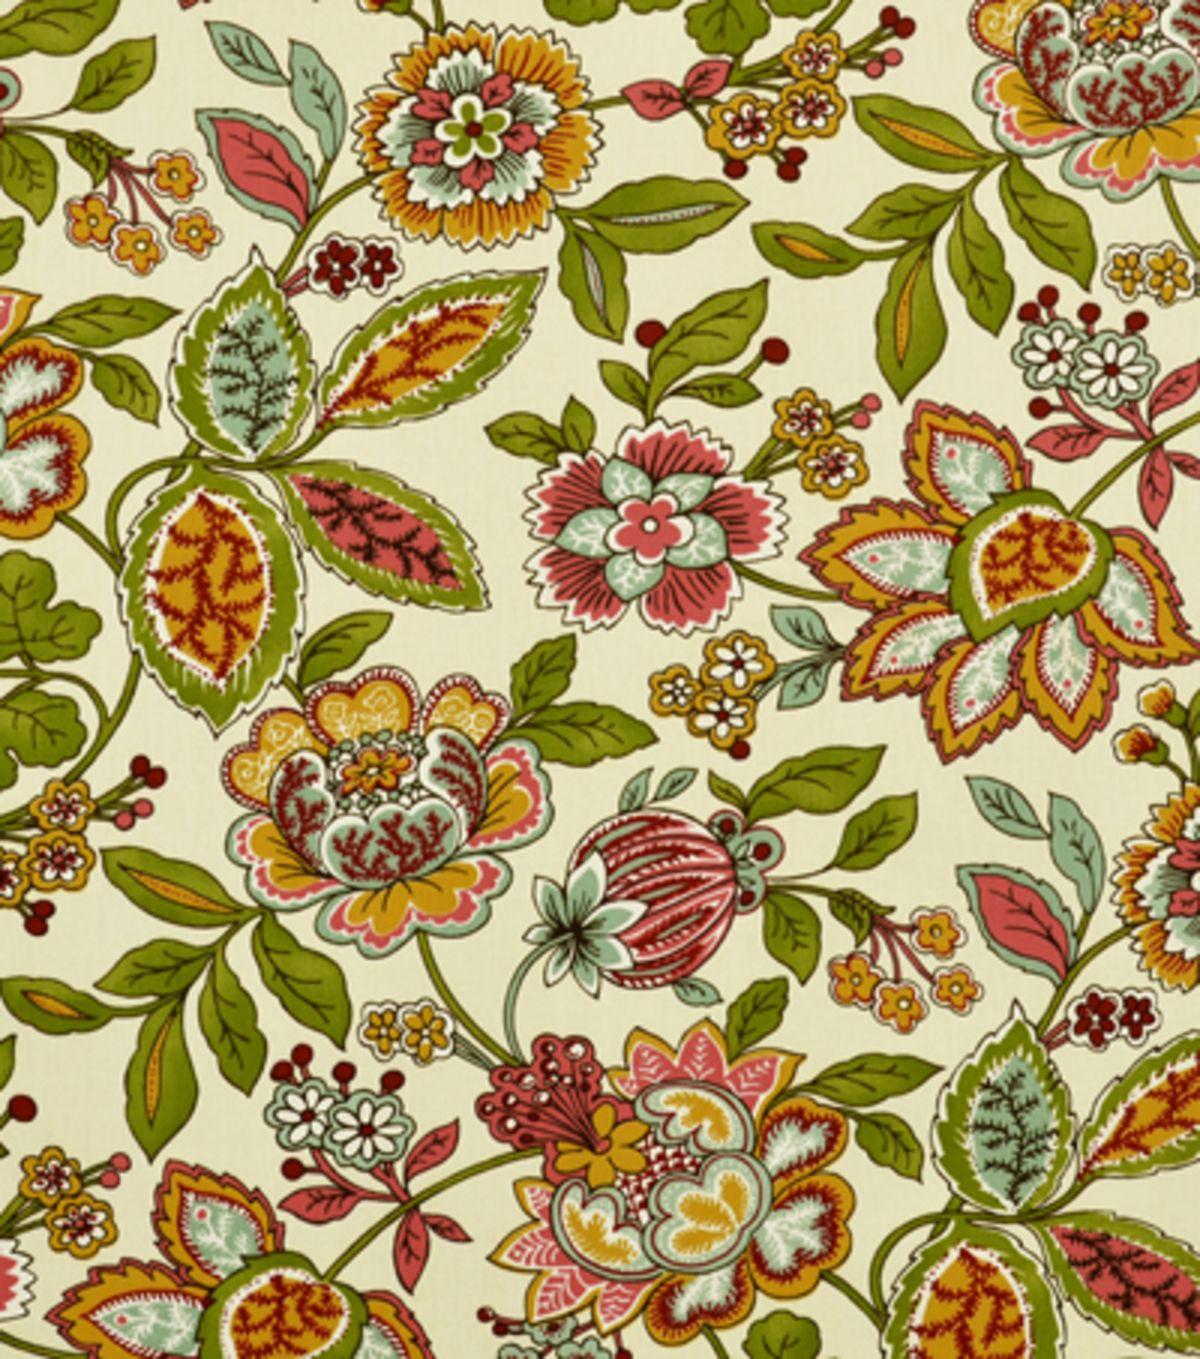 Covington Sadie 11 Multi - Home Decor Fabric - Decor Fabric at JOANN ...